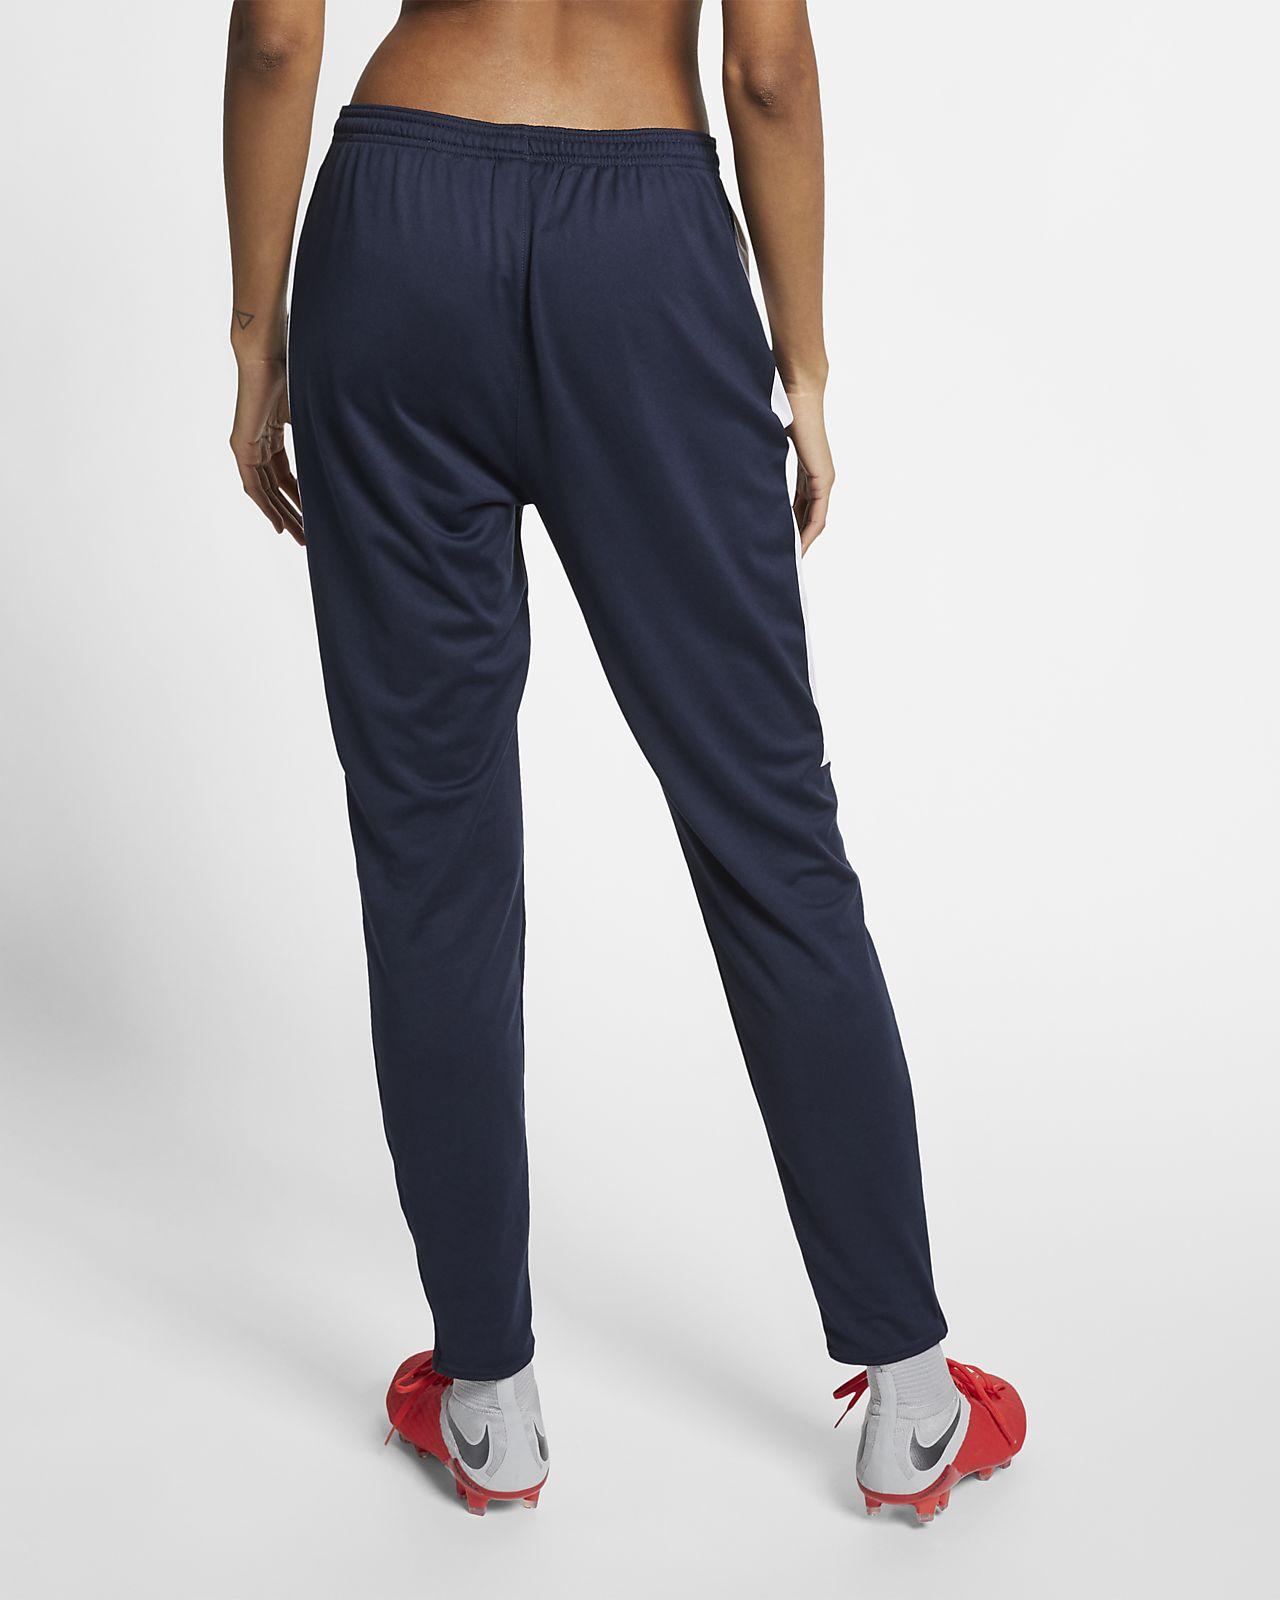 4579bfa92ae4 Nike Dri-FIT Academy Women's Soccer Pants. Nike.com